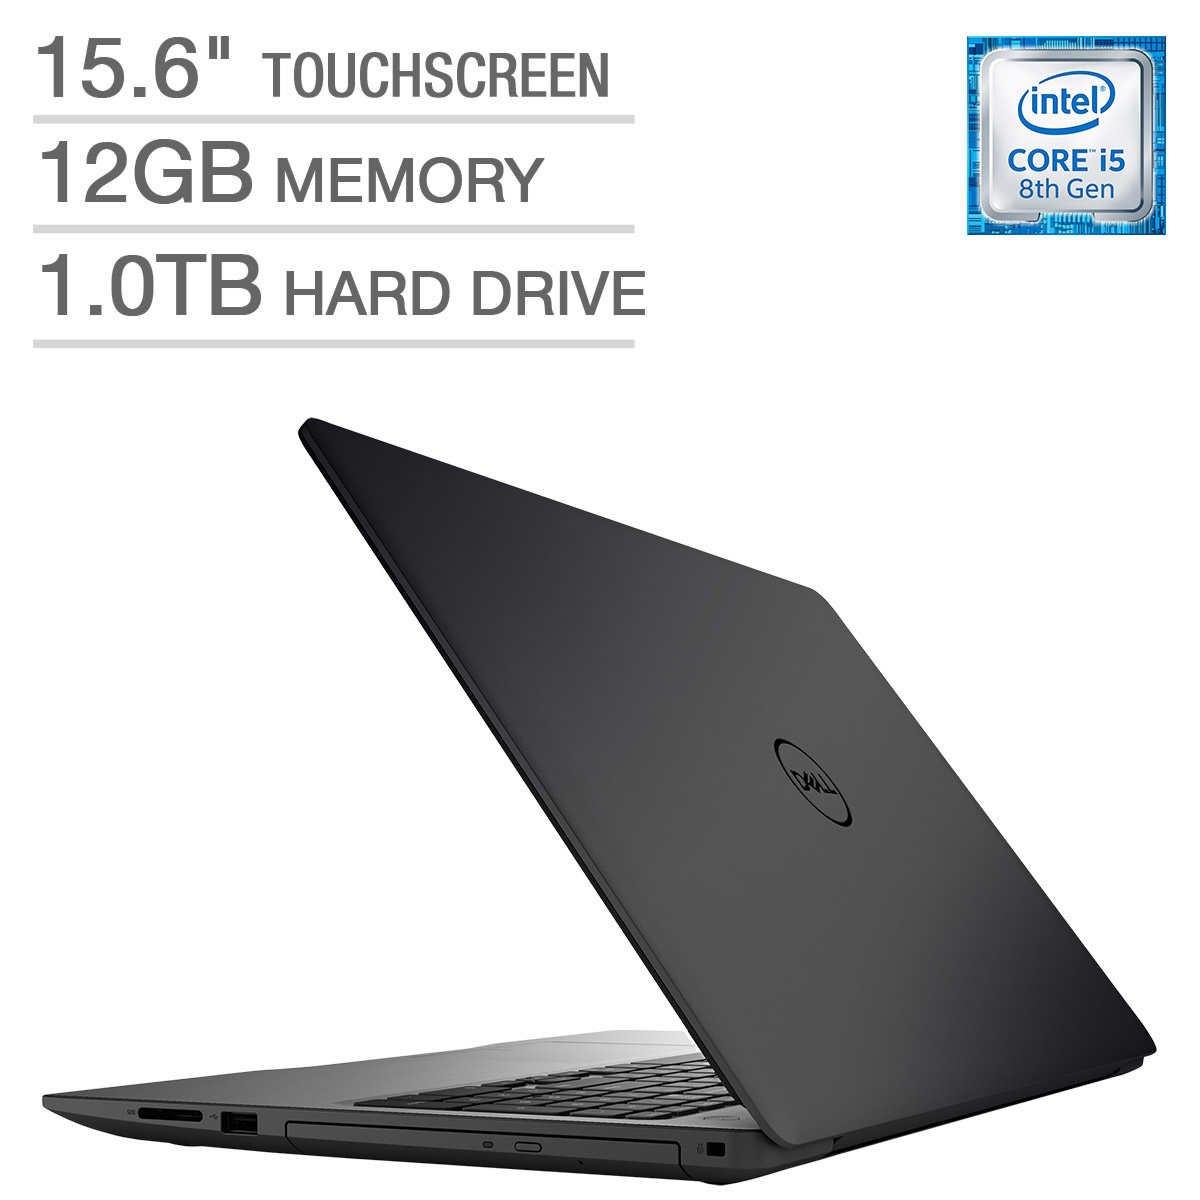 2018 Dell Inspiron 15 5000 Flagship Premium 15.6'' Full HD Touchscreen Backlit Keyboard Laptop, Intel Core i5-8250U Quad-Core, 12GB DDR4, 1TB HDD, DVD-RW, Bluetooth 4.2, Windows 10, Black